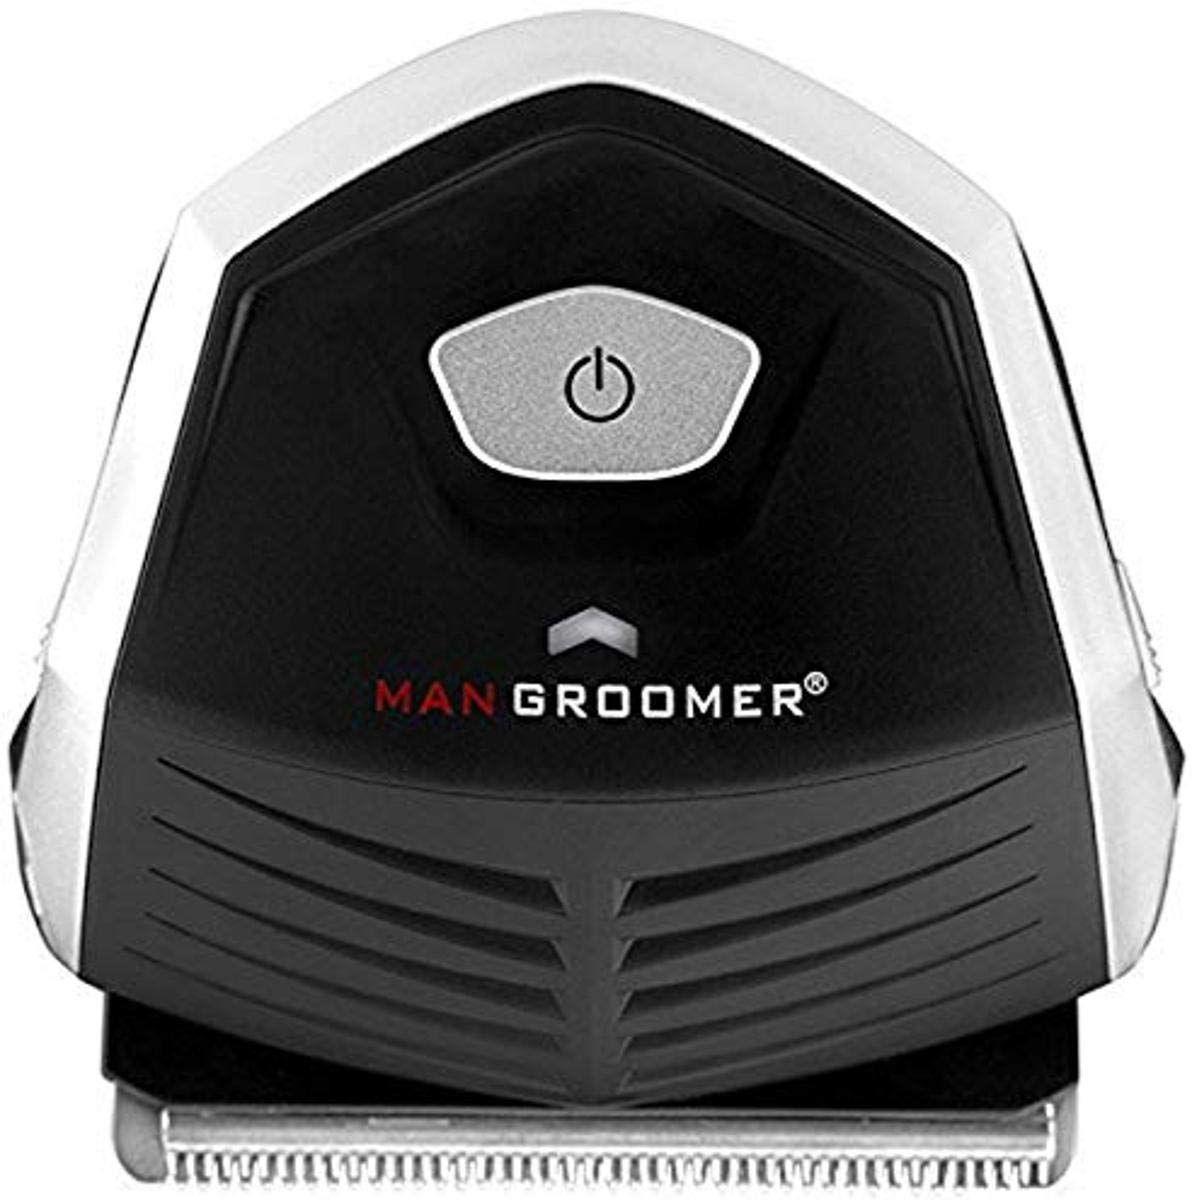 MANGROOMER ULTIMATE PRO Self-Haircut Kit